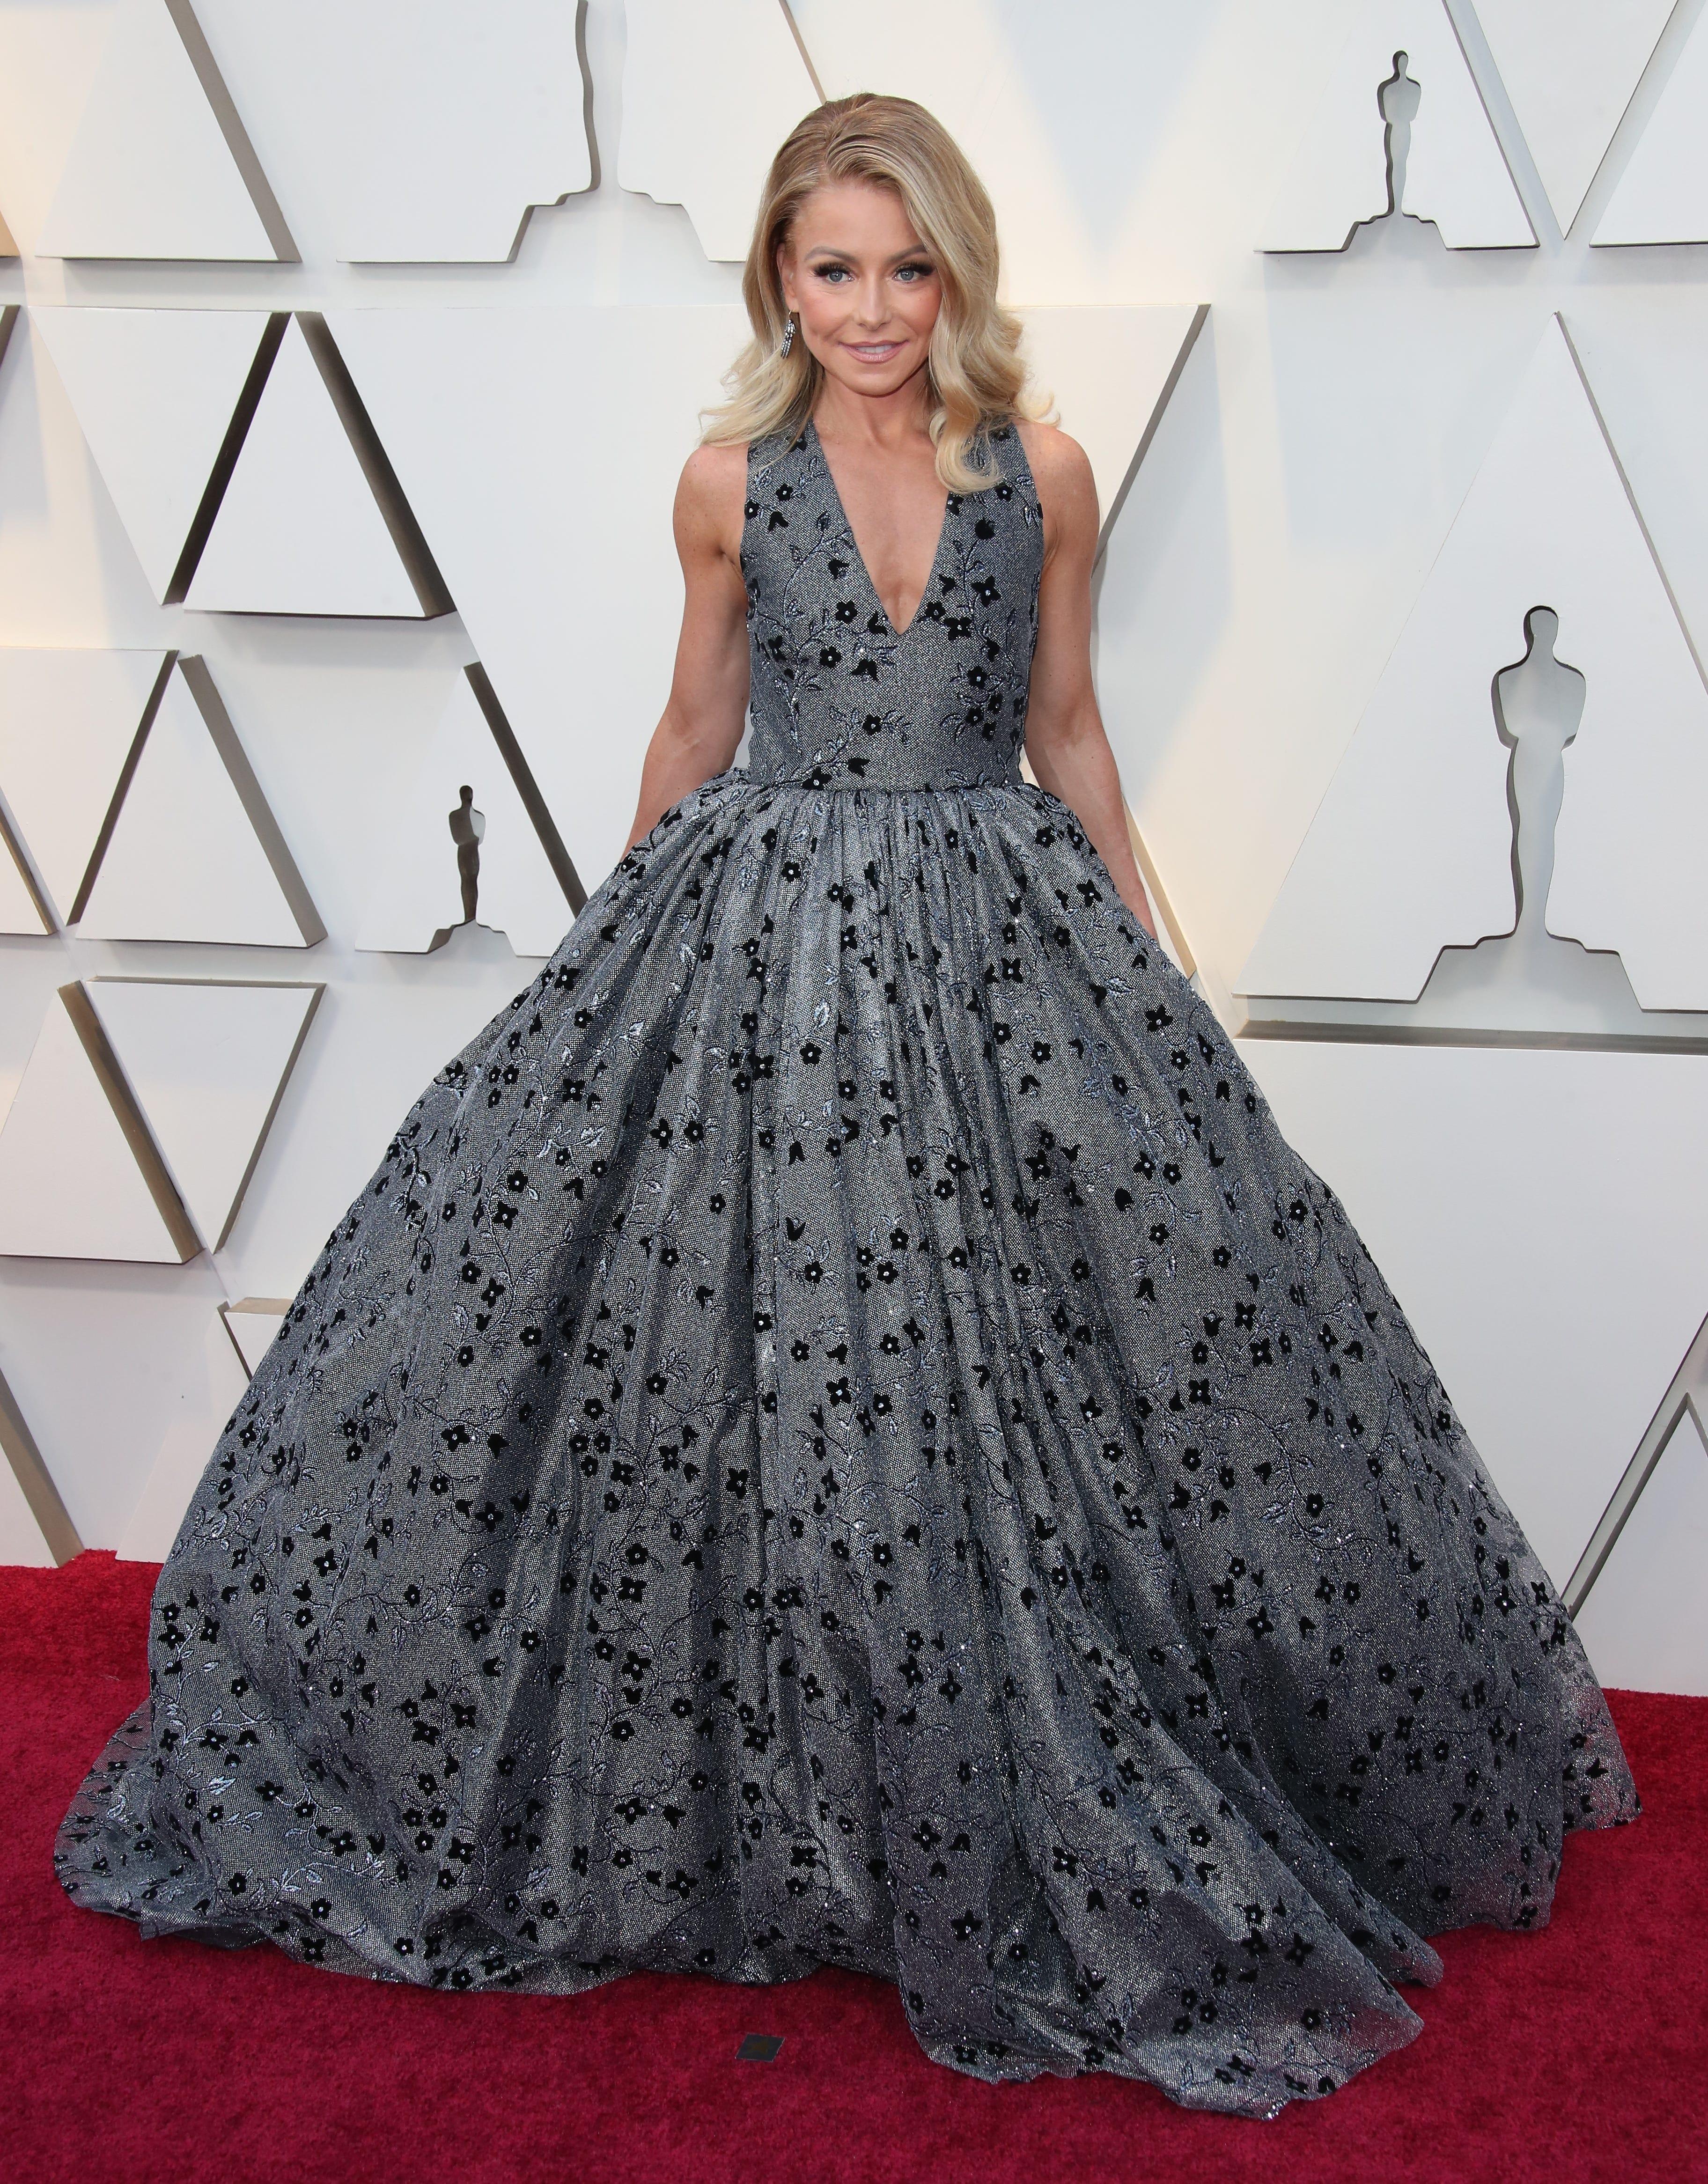 February 24, 2019; Los Angeles, CA, USA; Kelly Ripa arrives at the 91st Academy Awards at the Dolby Theatre. Mandatory Credit: Dan MacMedan-USA TODAY NETWORK (Via OlyDrop)